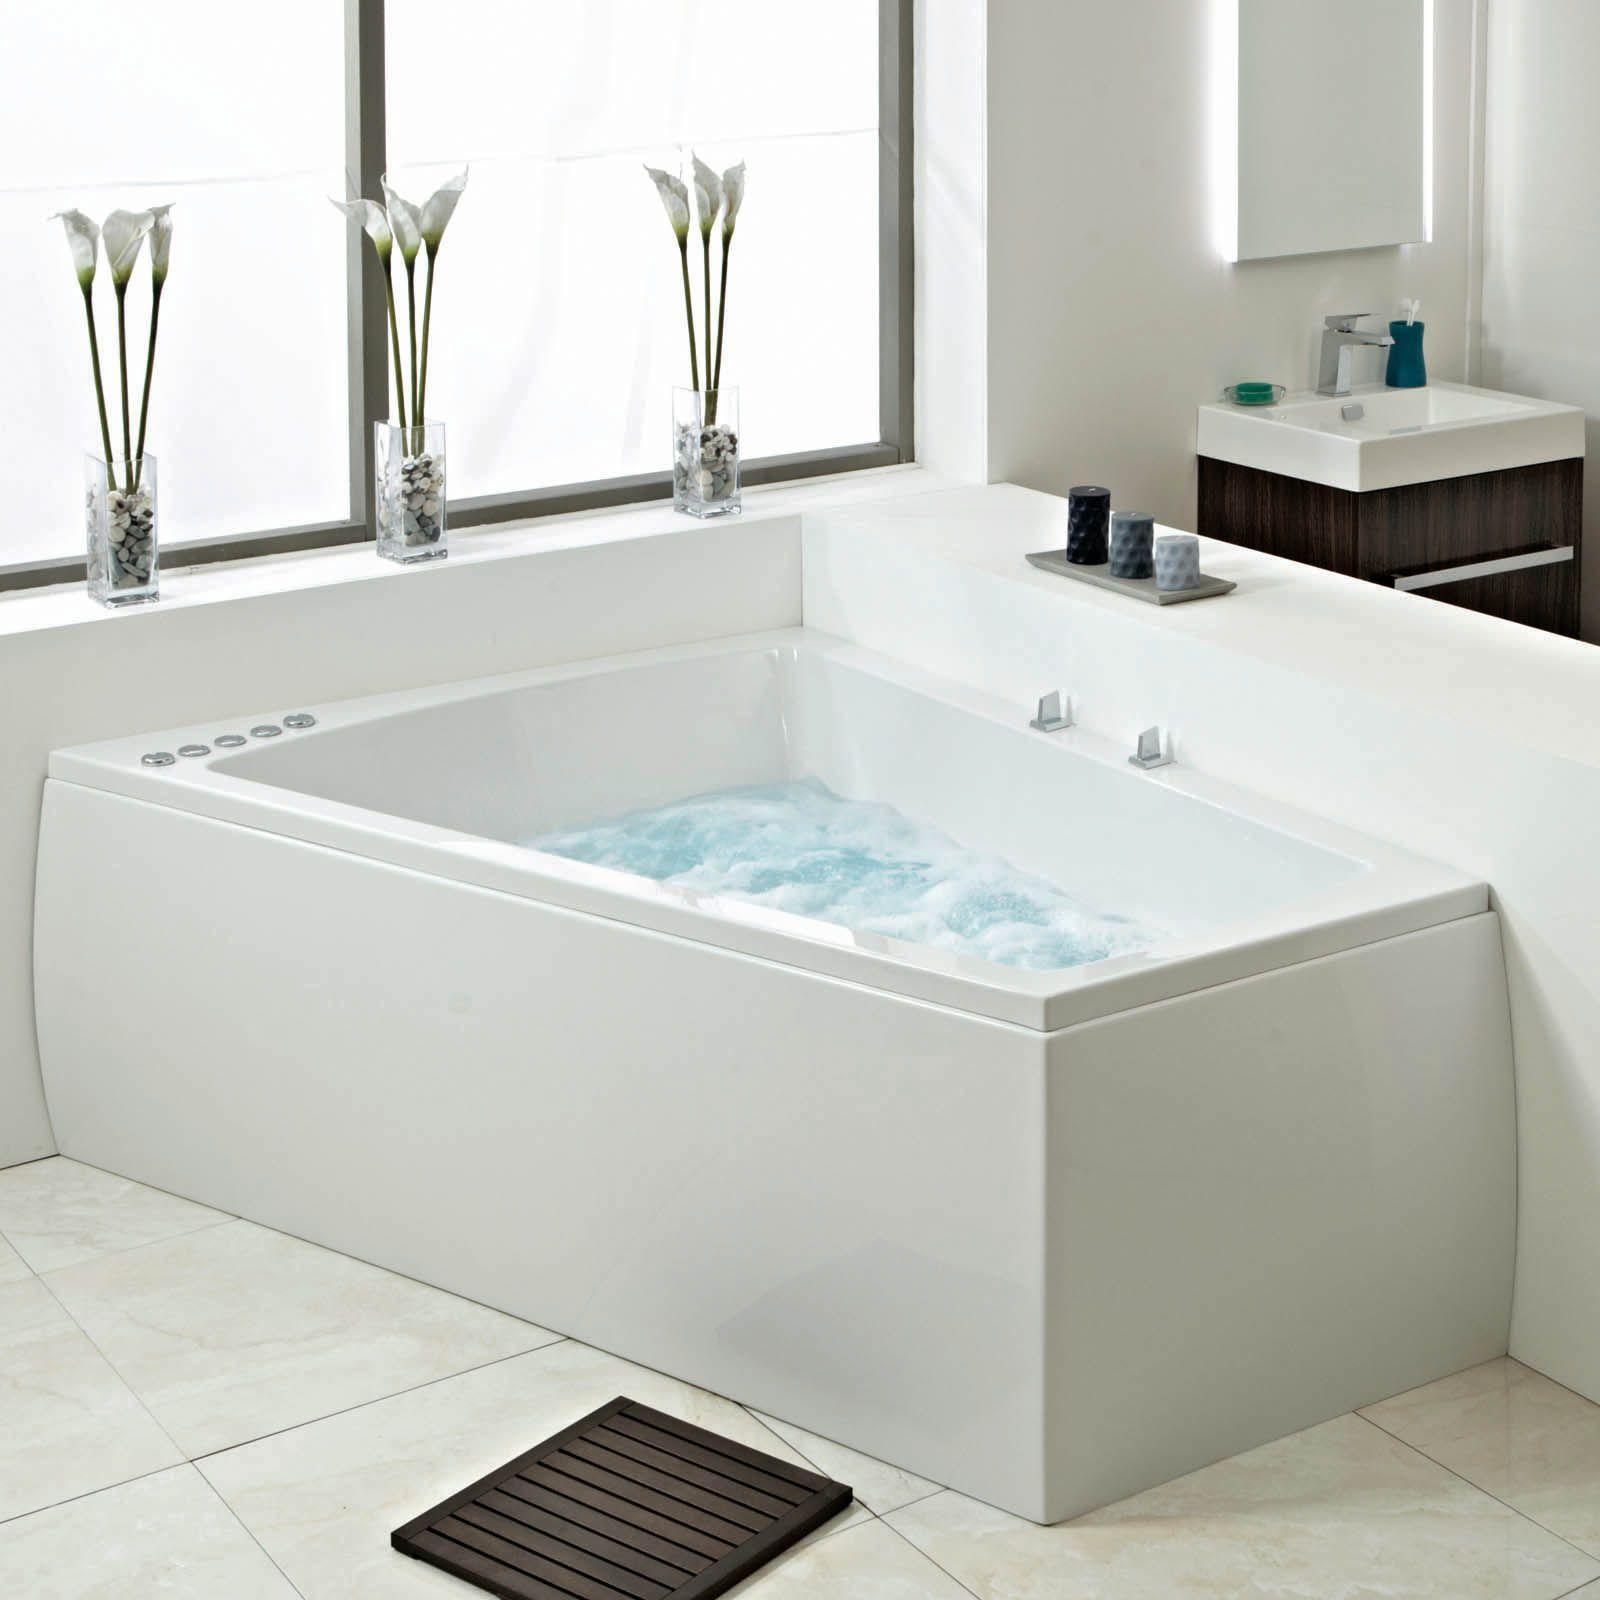 Pin by Phoenix Bathrooms on Phoenix Luxury Bathing - A Selection of ...